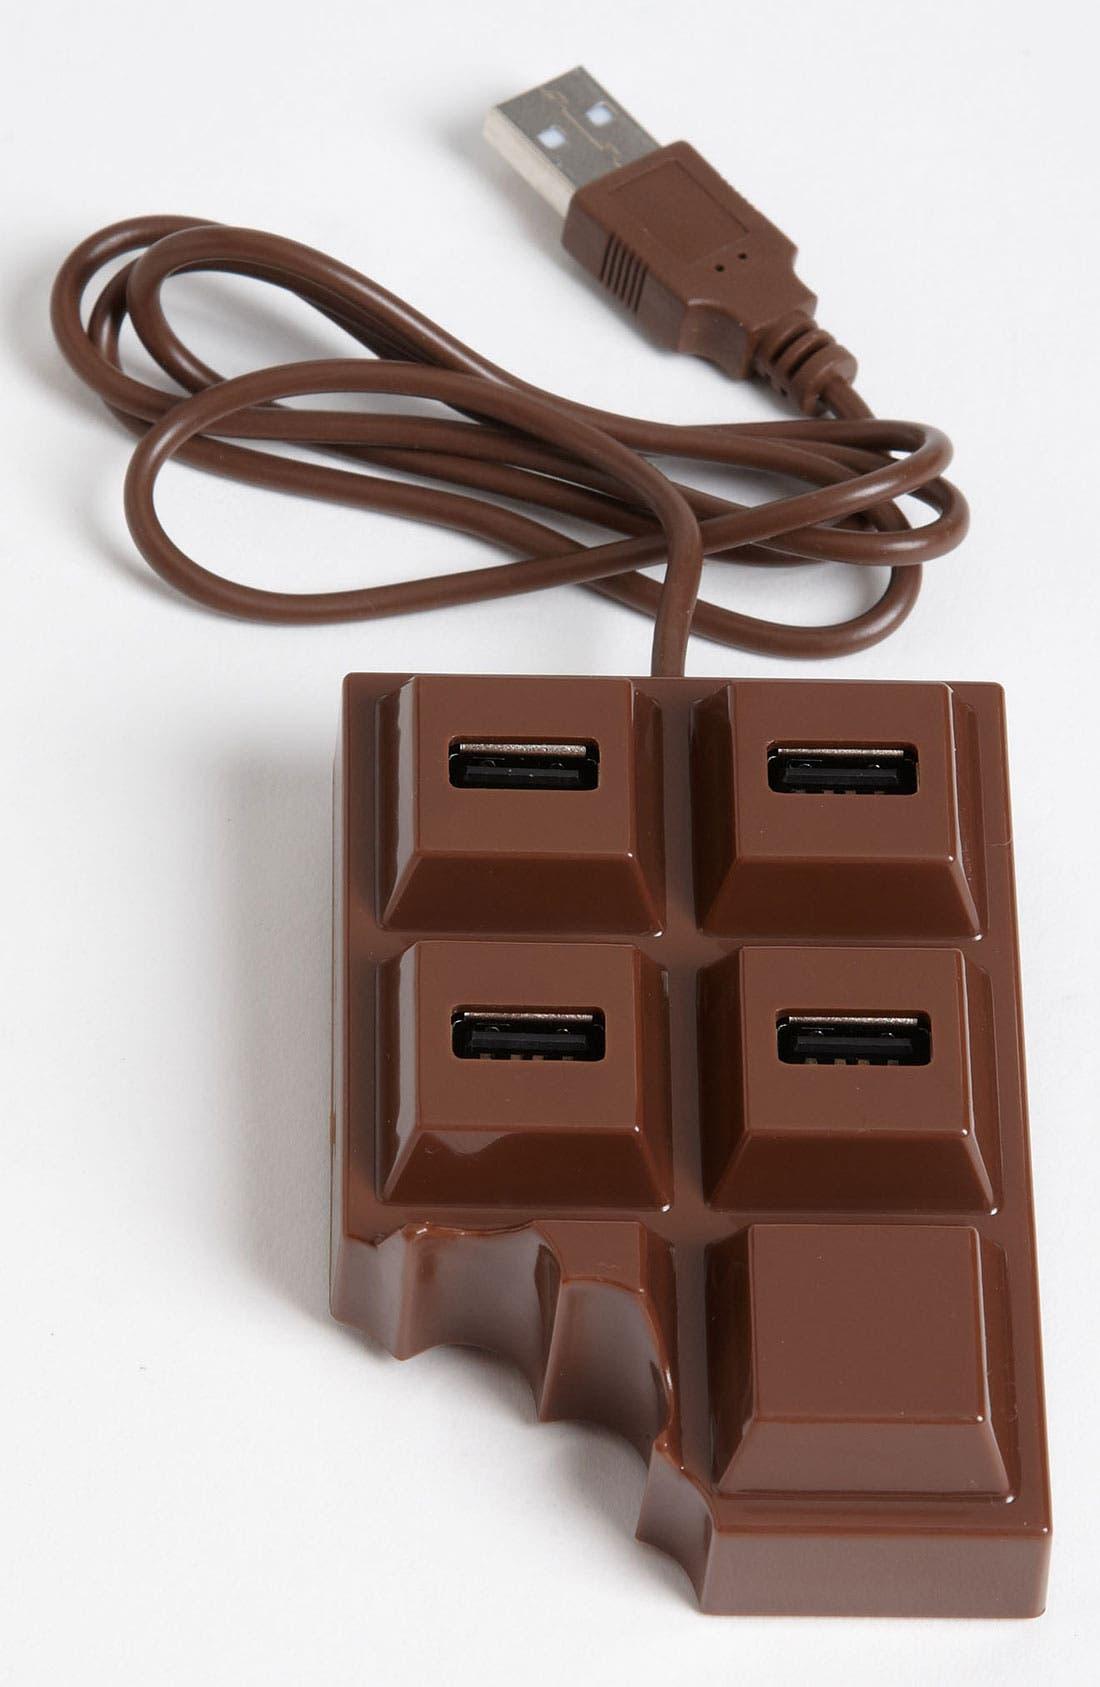 Main Image - Kikkerland Design 'Chocolate' USB Hub